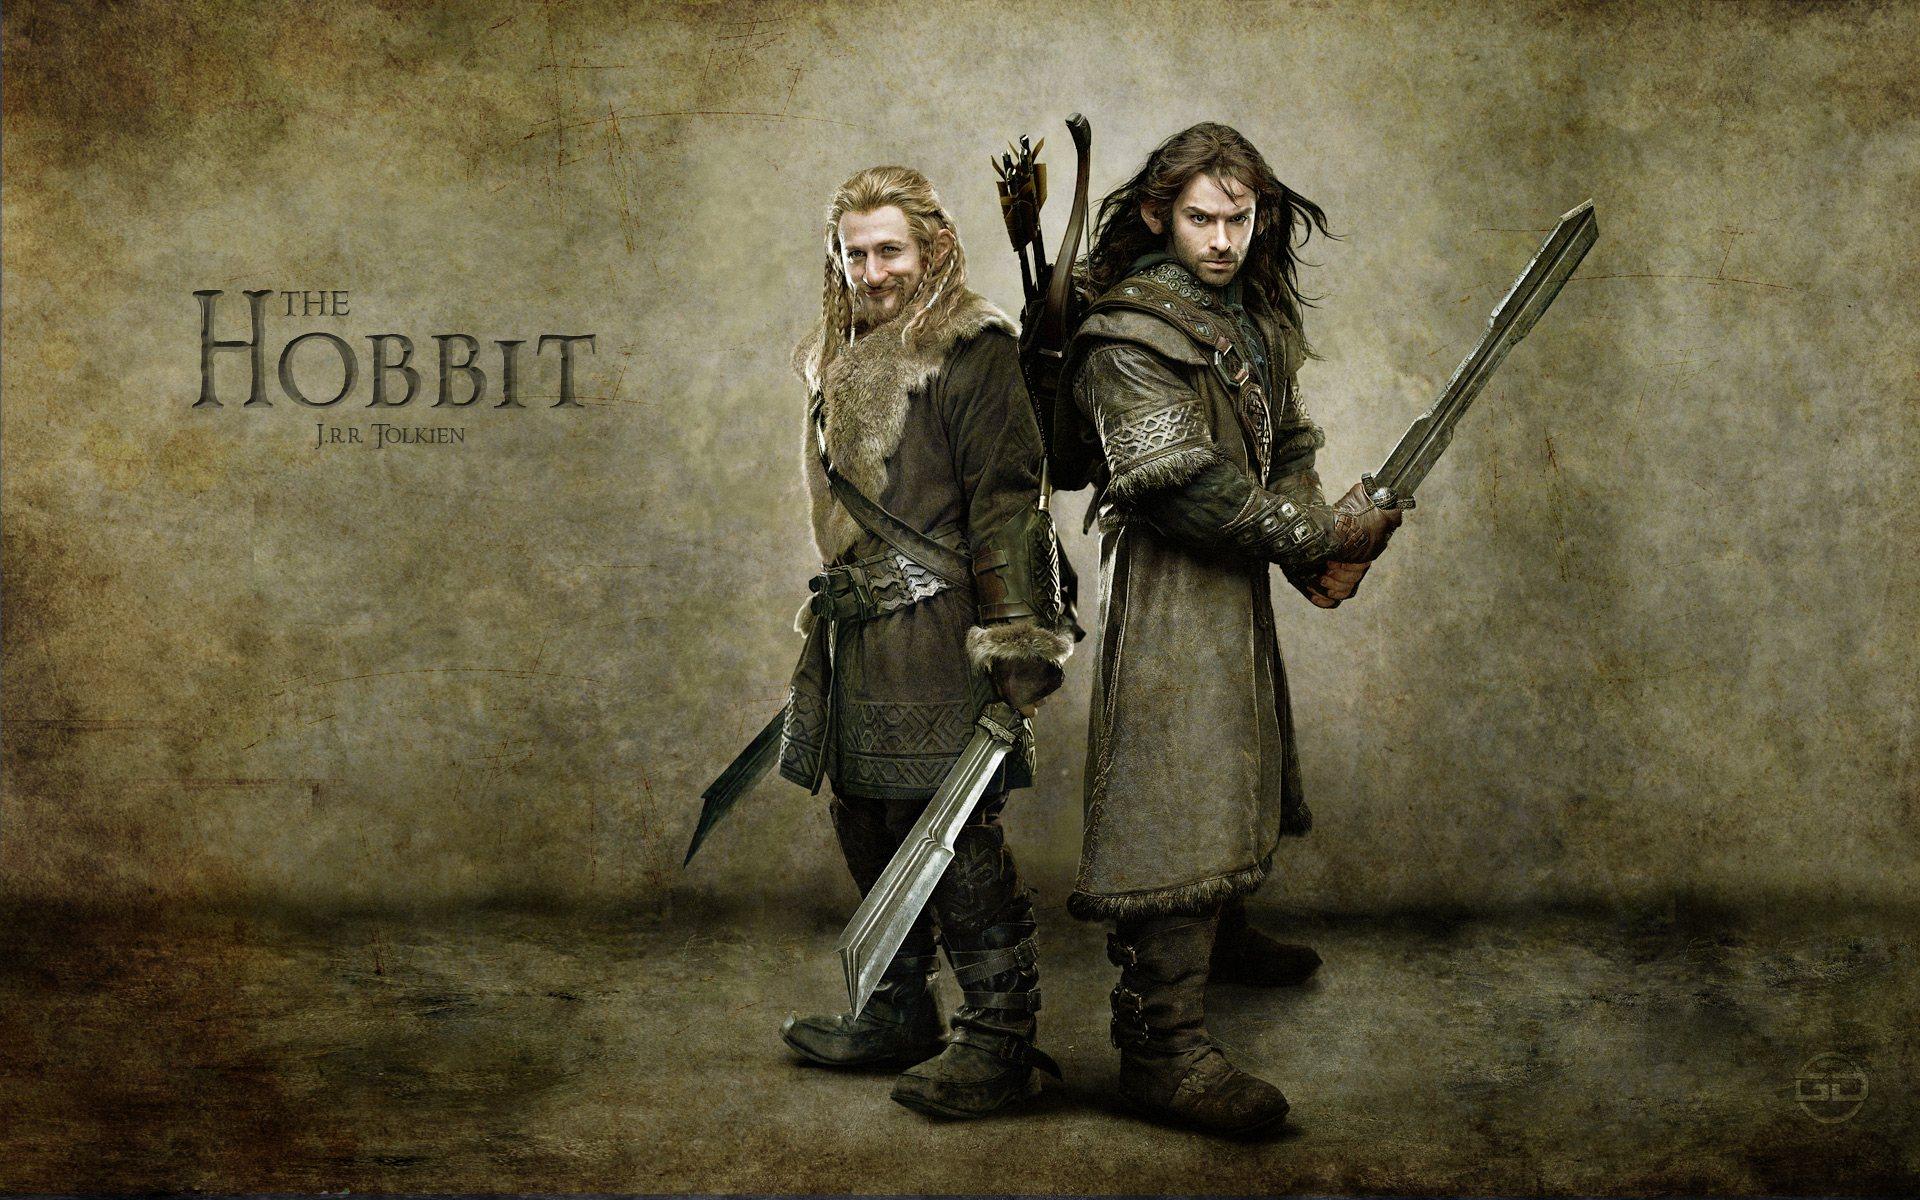 18 The Hobbit An Unexpected Journey Wallpapers   DezineGuide 1920x1200